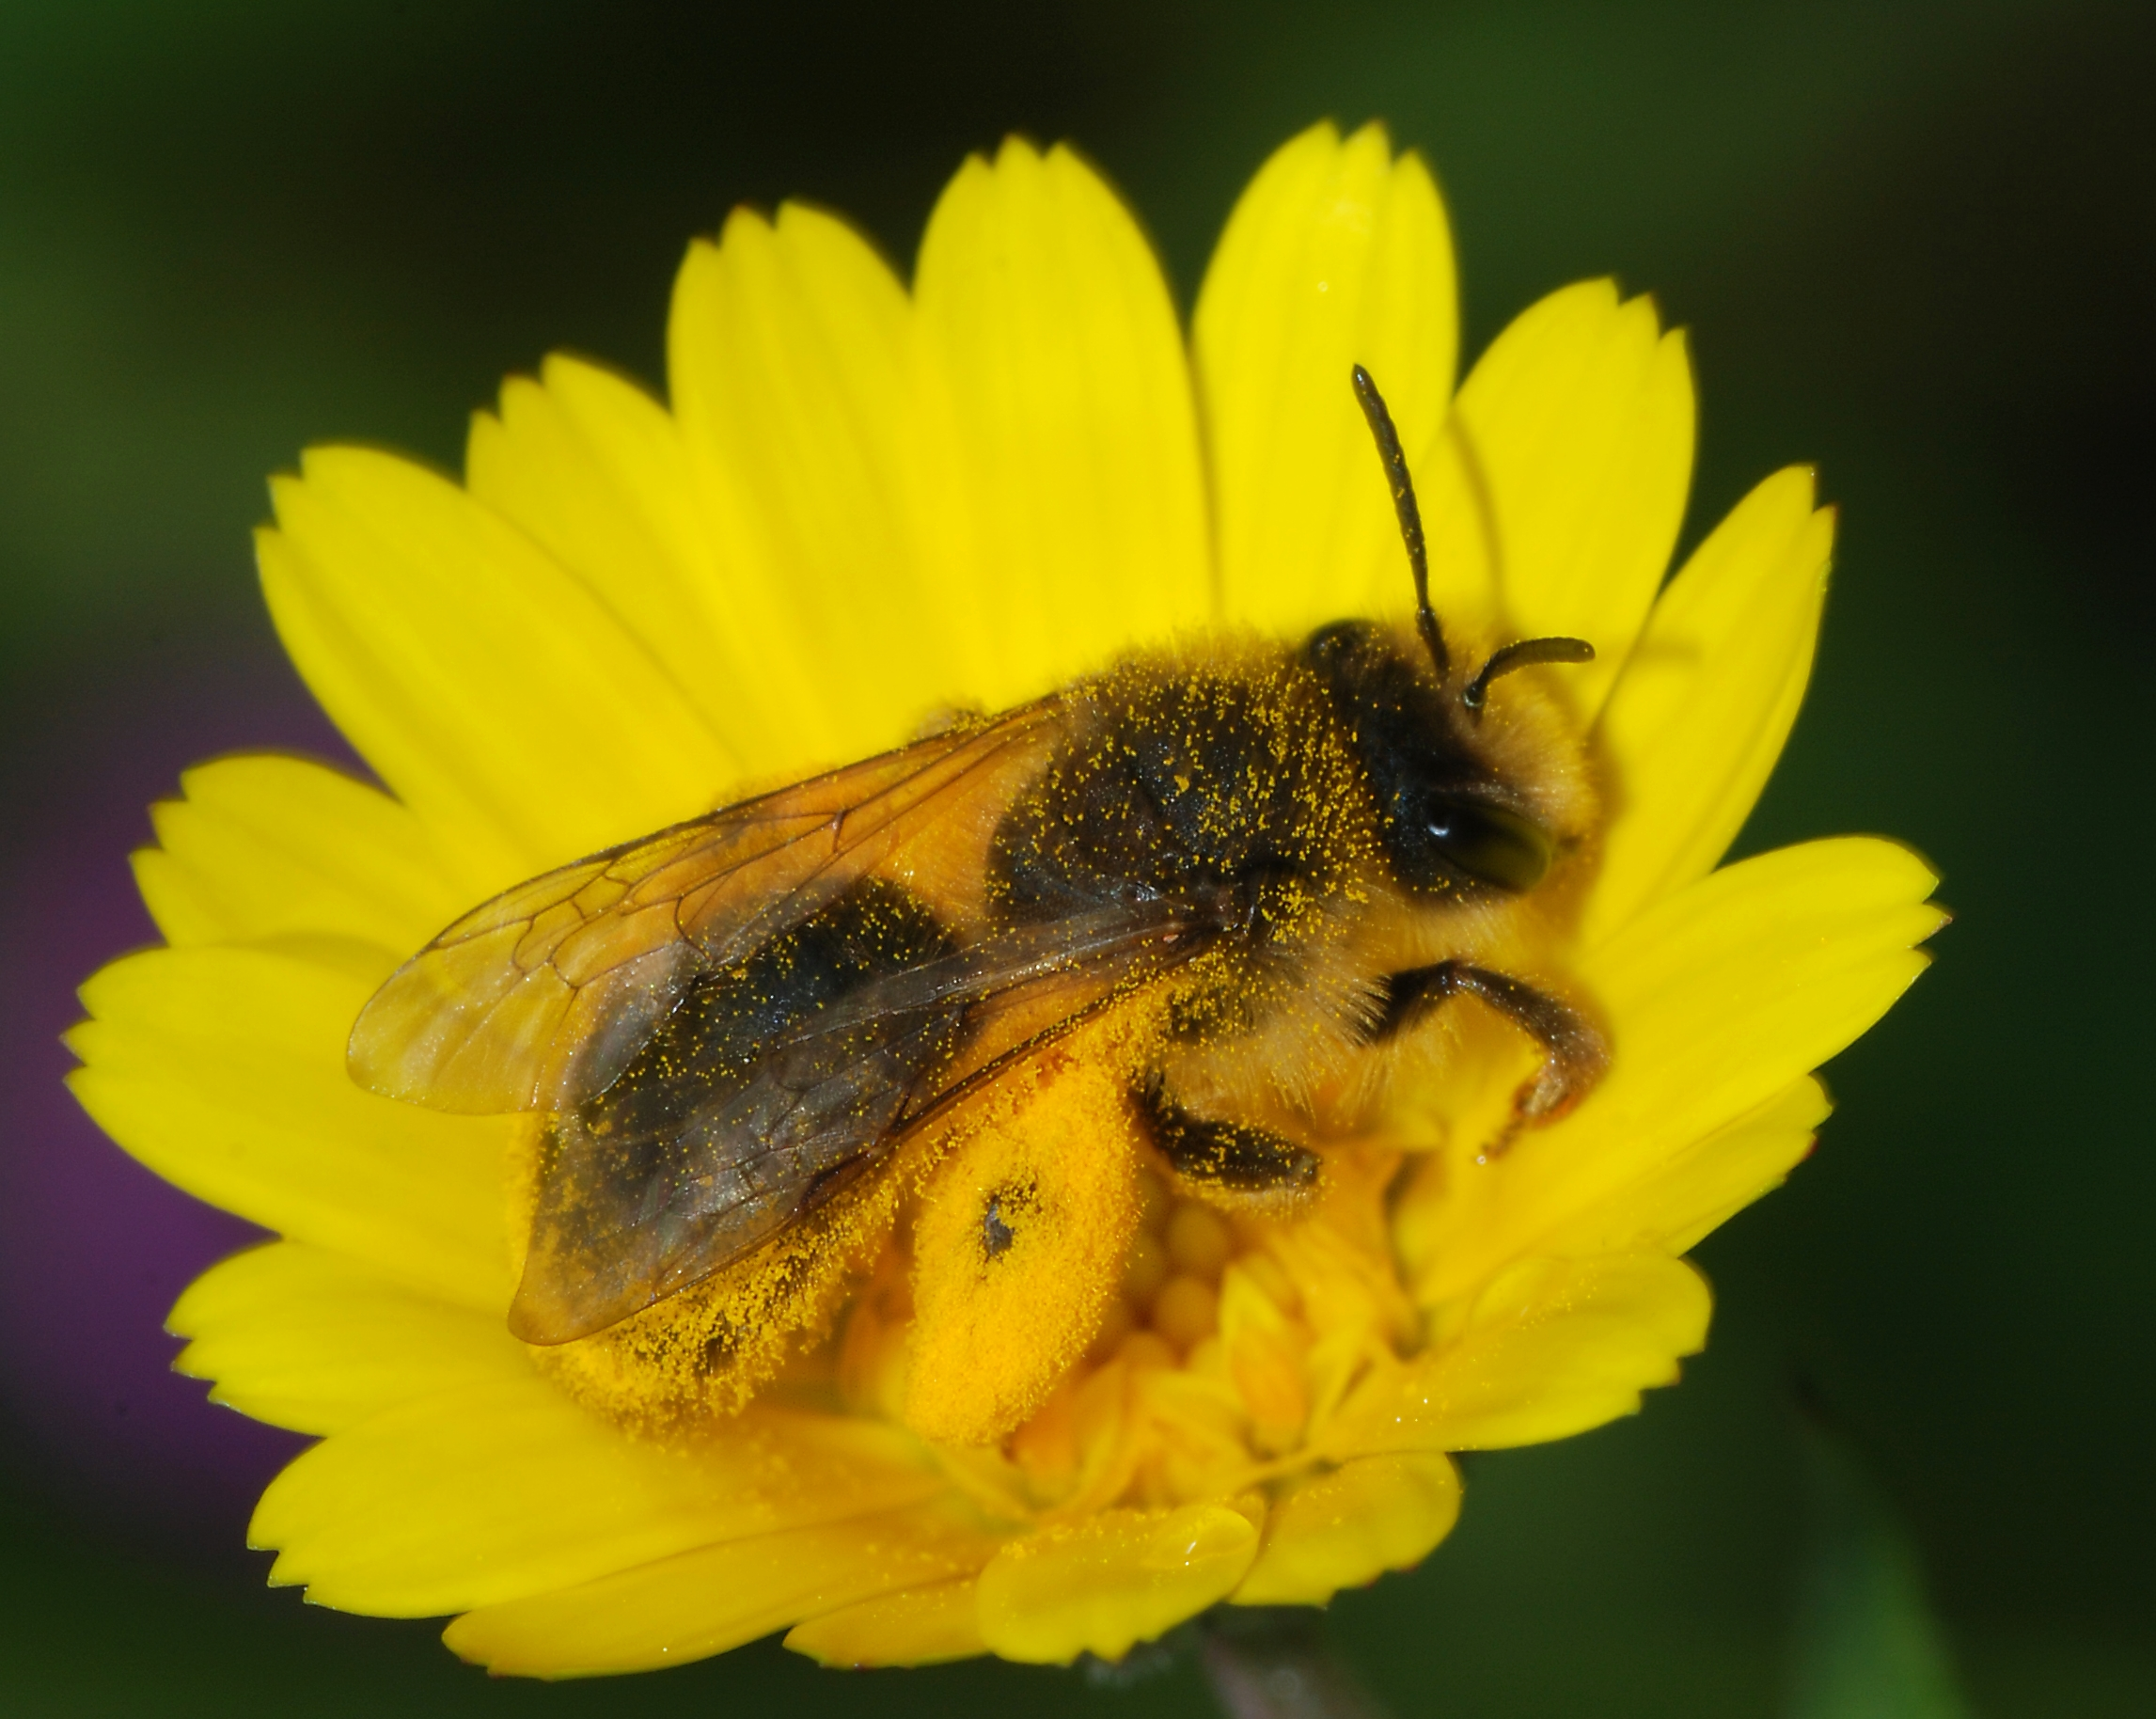 Andrena - Wikipedia